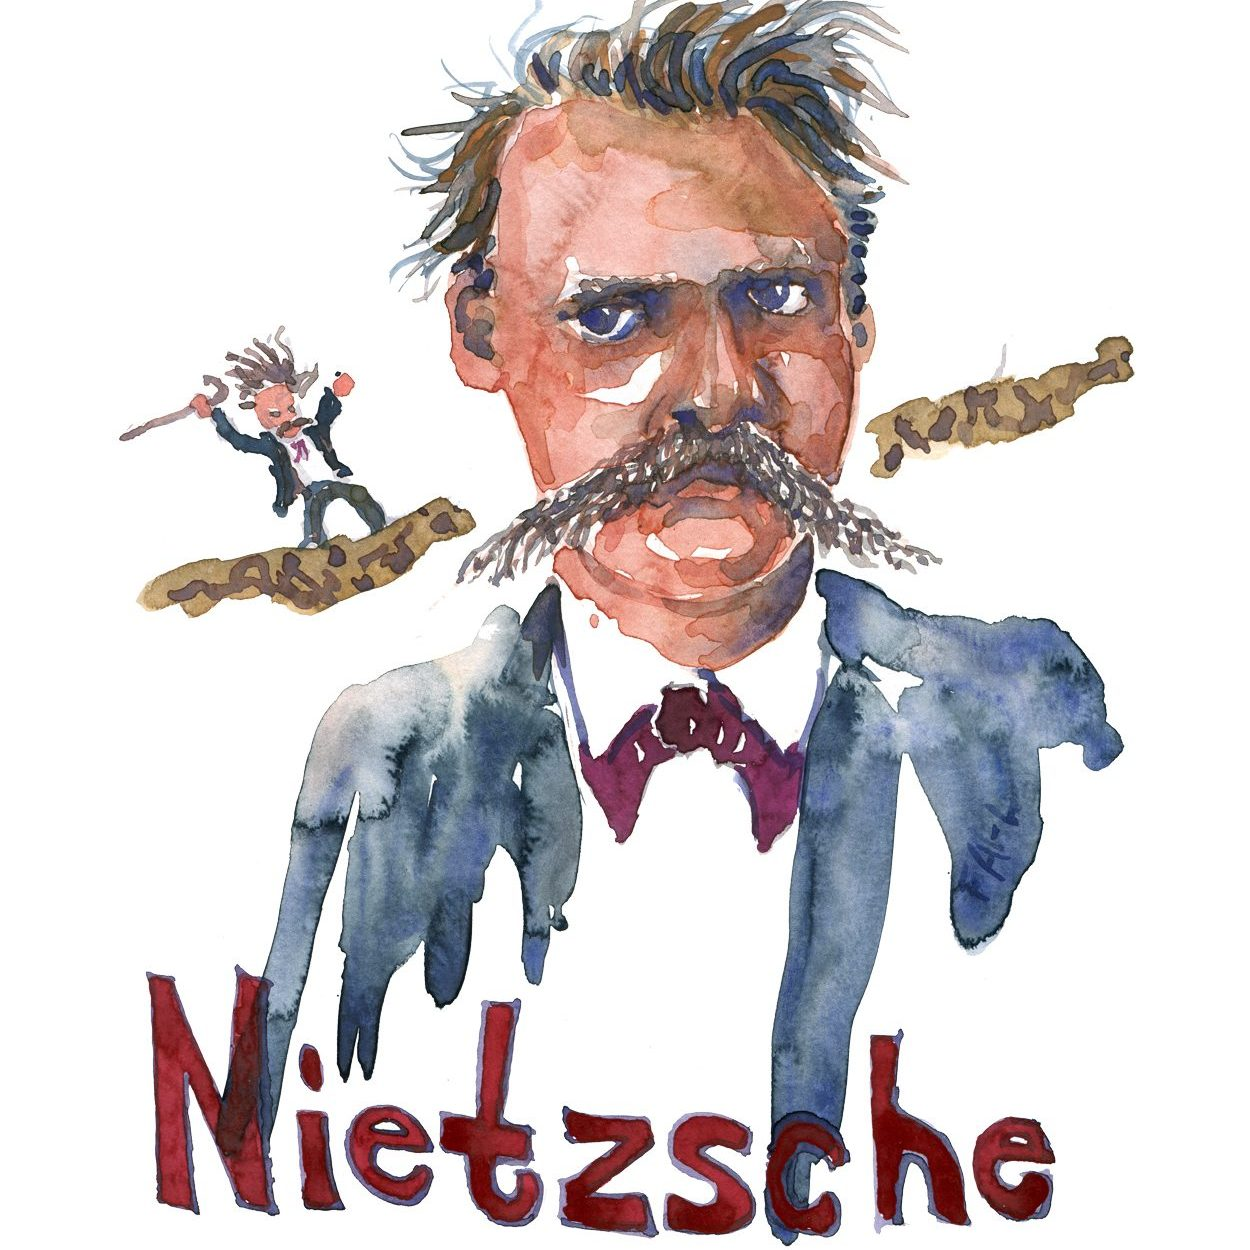 Watercolor portrait of Friedrich Nietzsche by Frits Ahlefeldt